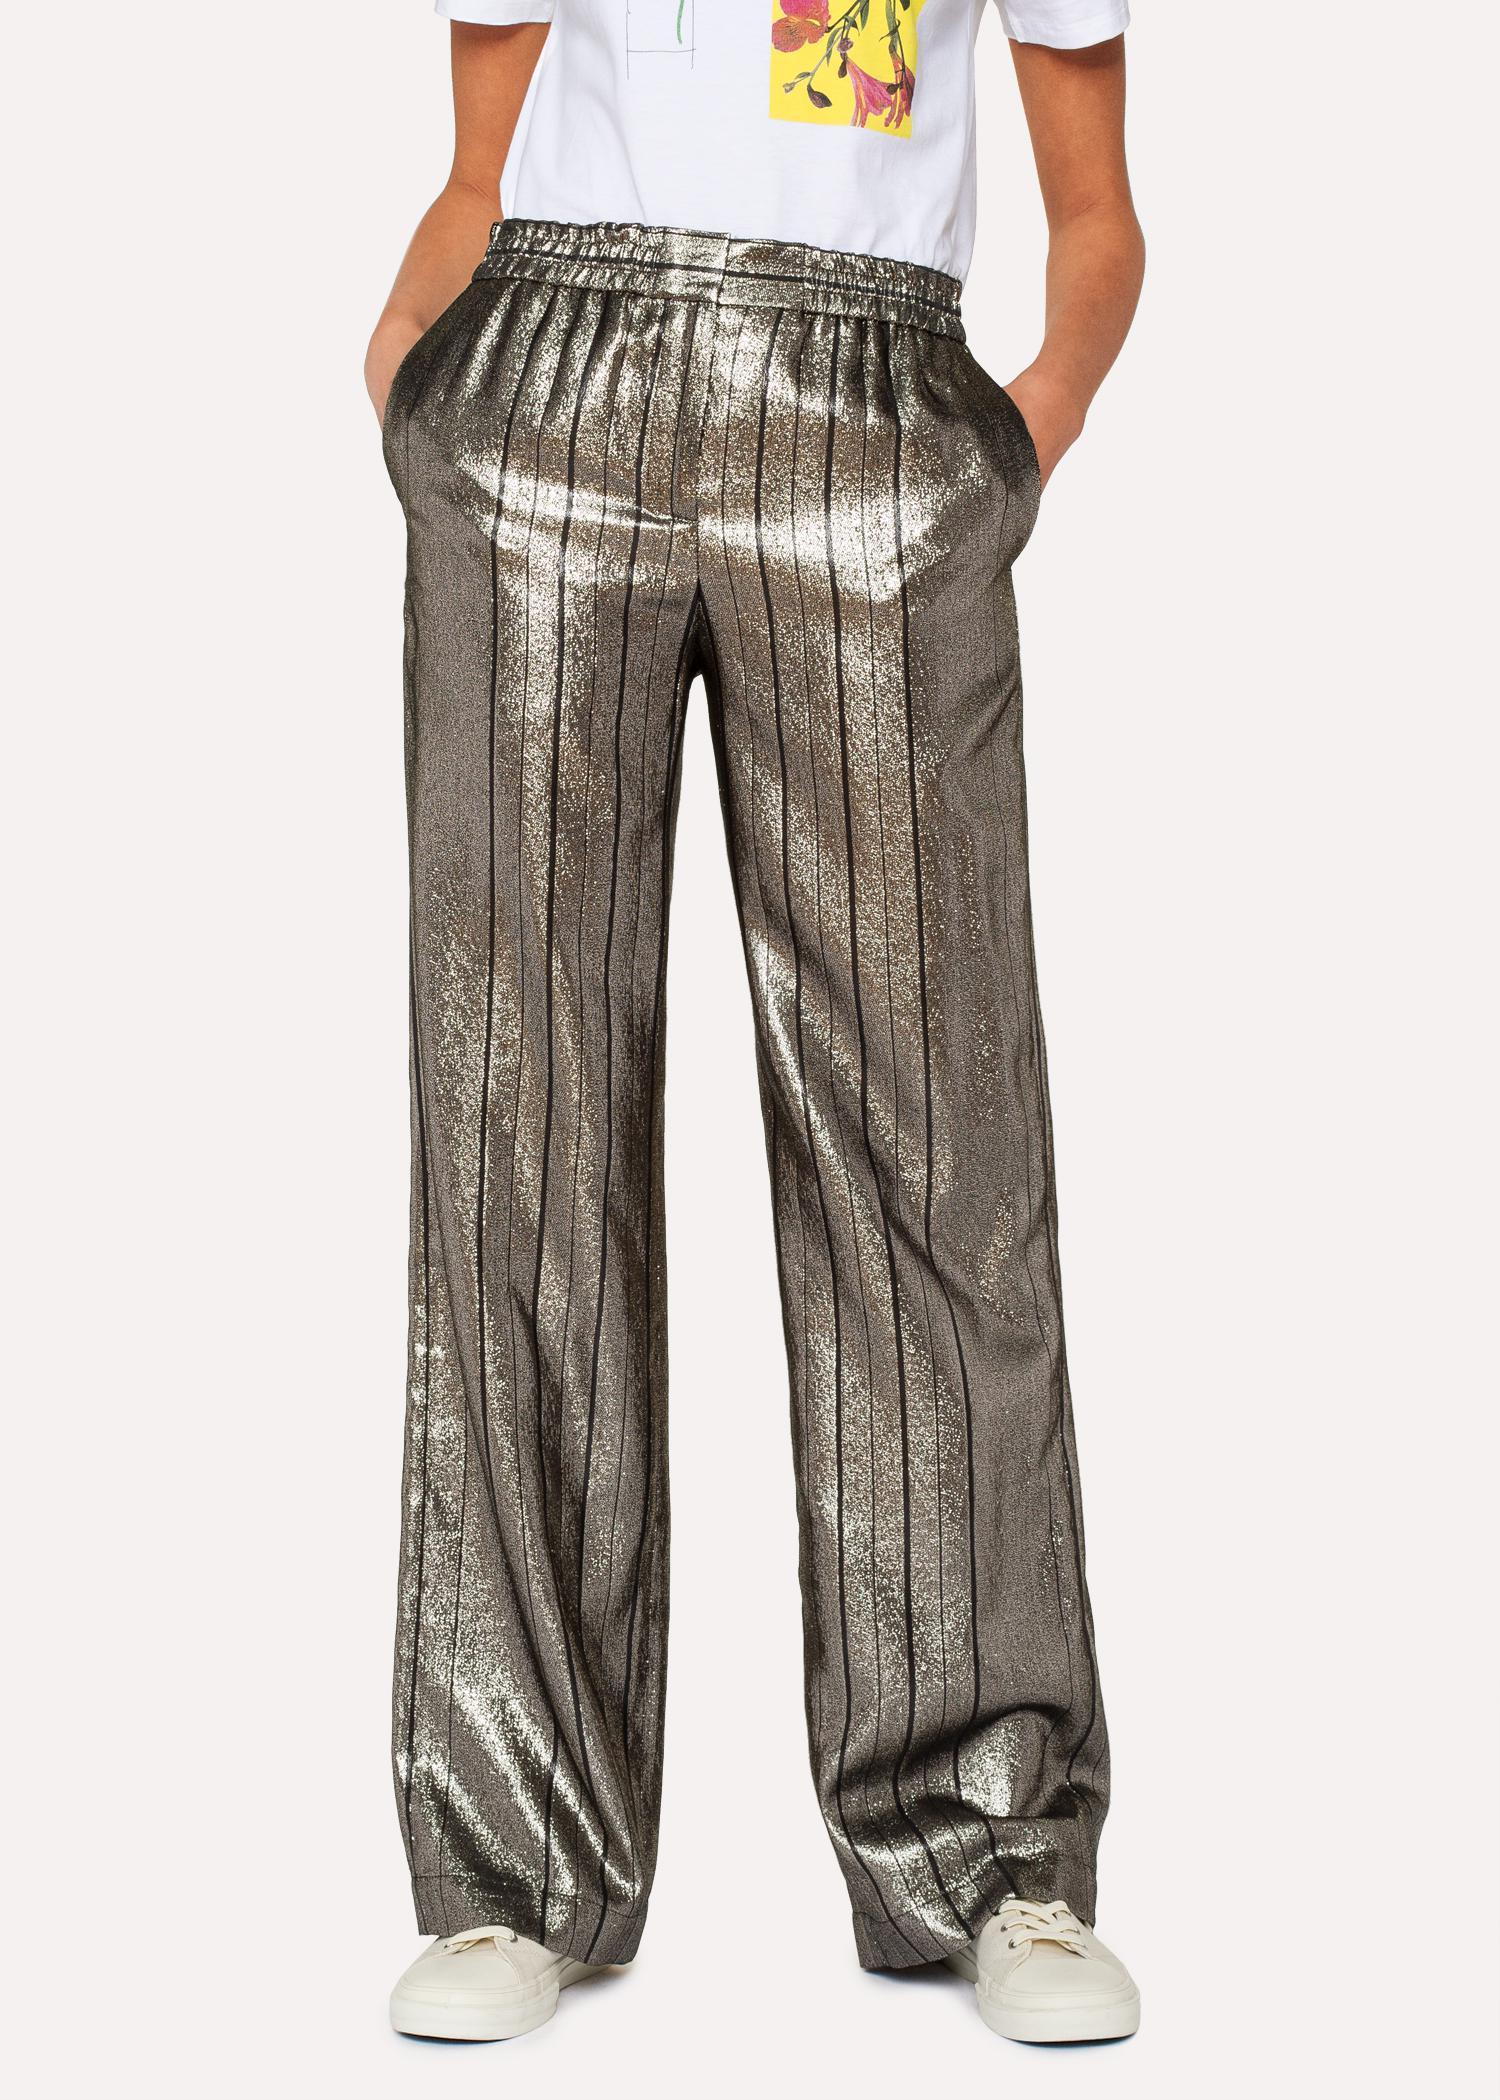 striped wide-leg trousers - Multicolour Paul Smith kfFNr6gE